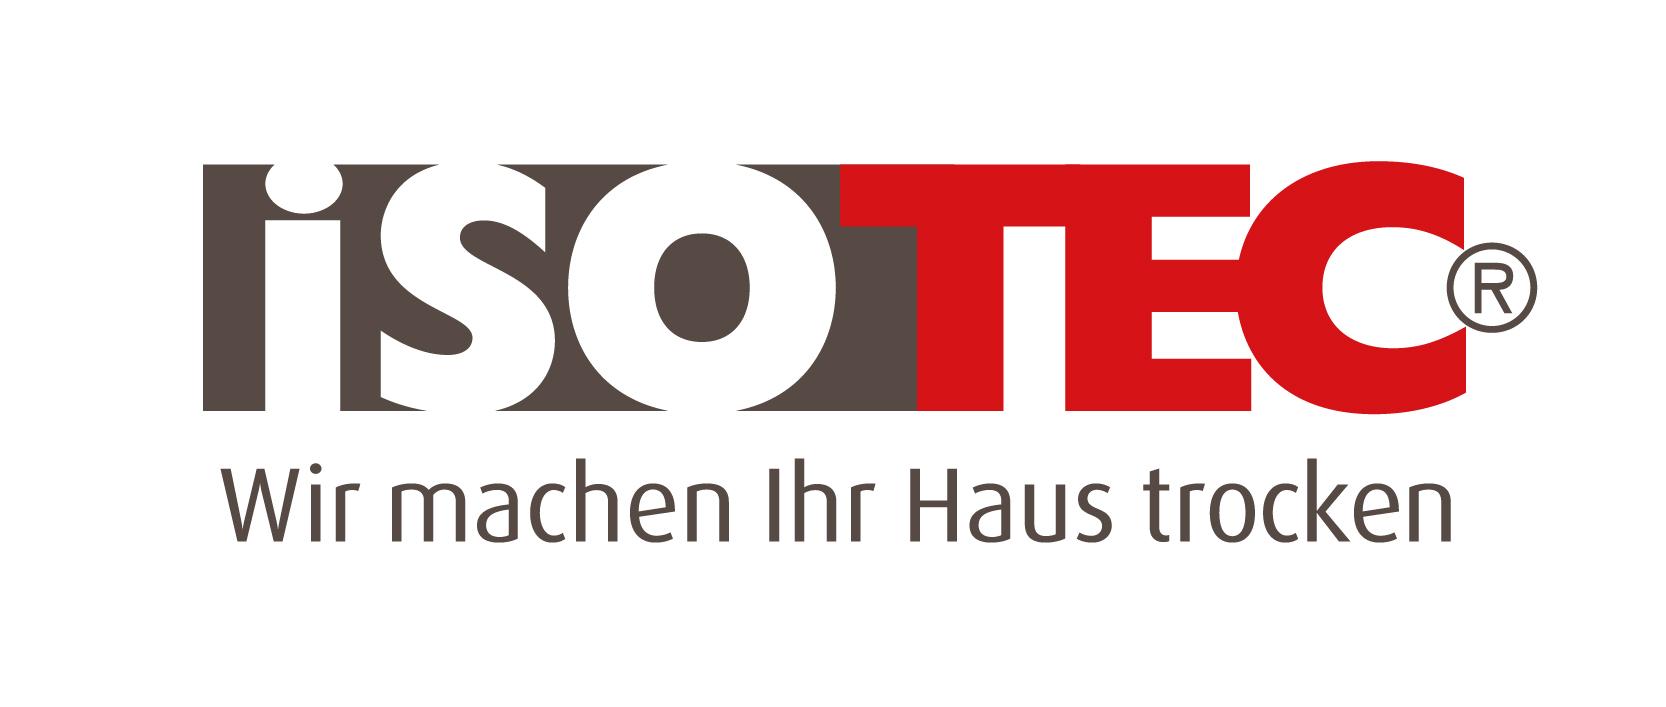 ISOTEC-Fachbetrieb Gebhardt + Gebhardt GmbH